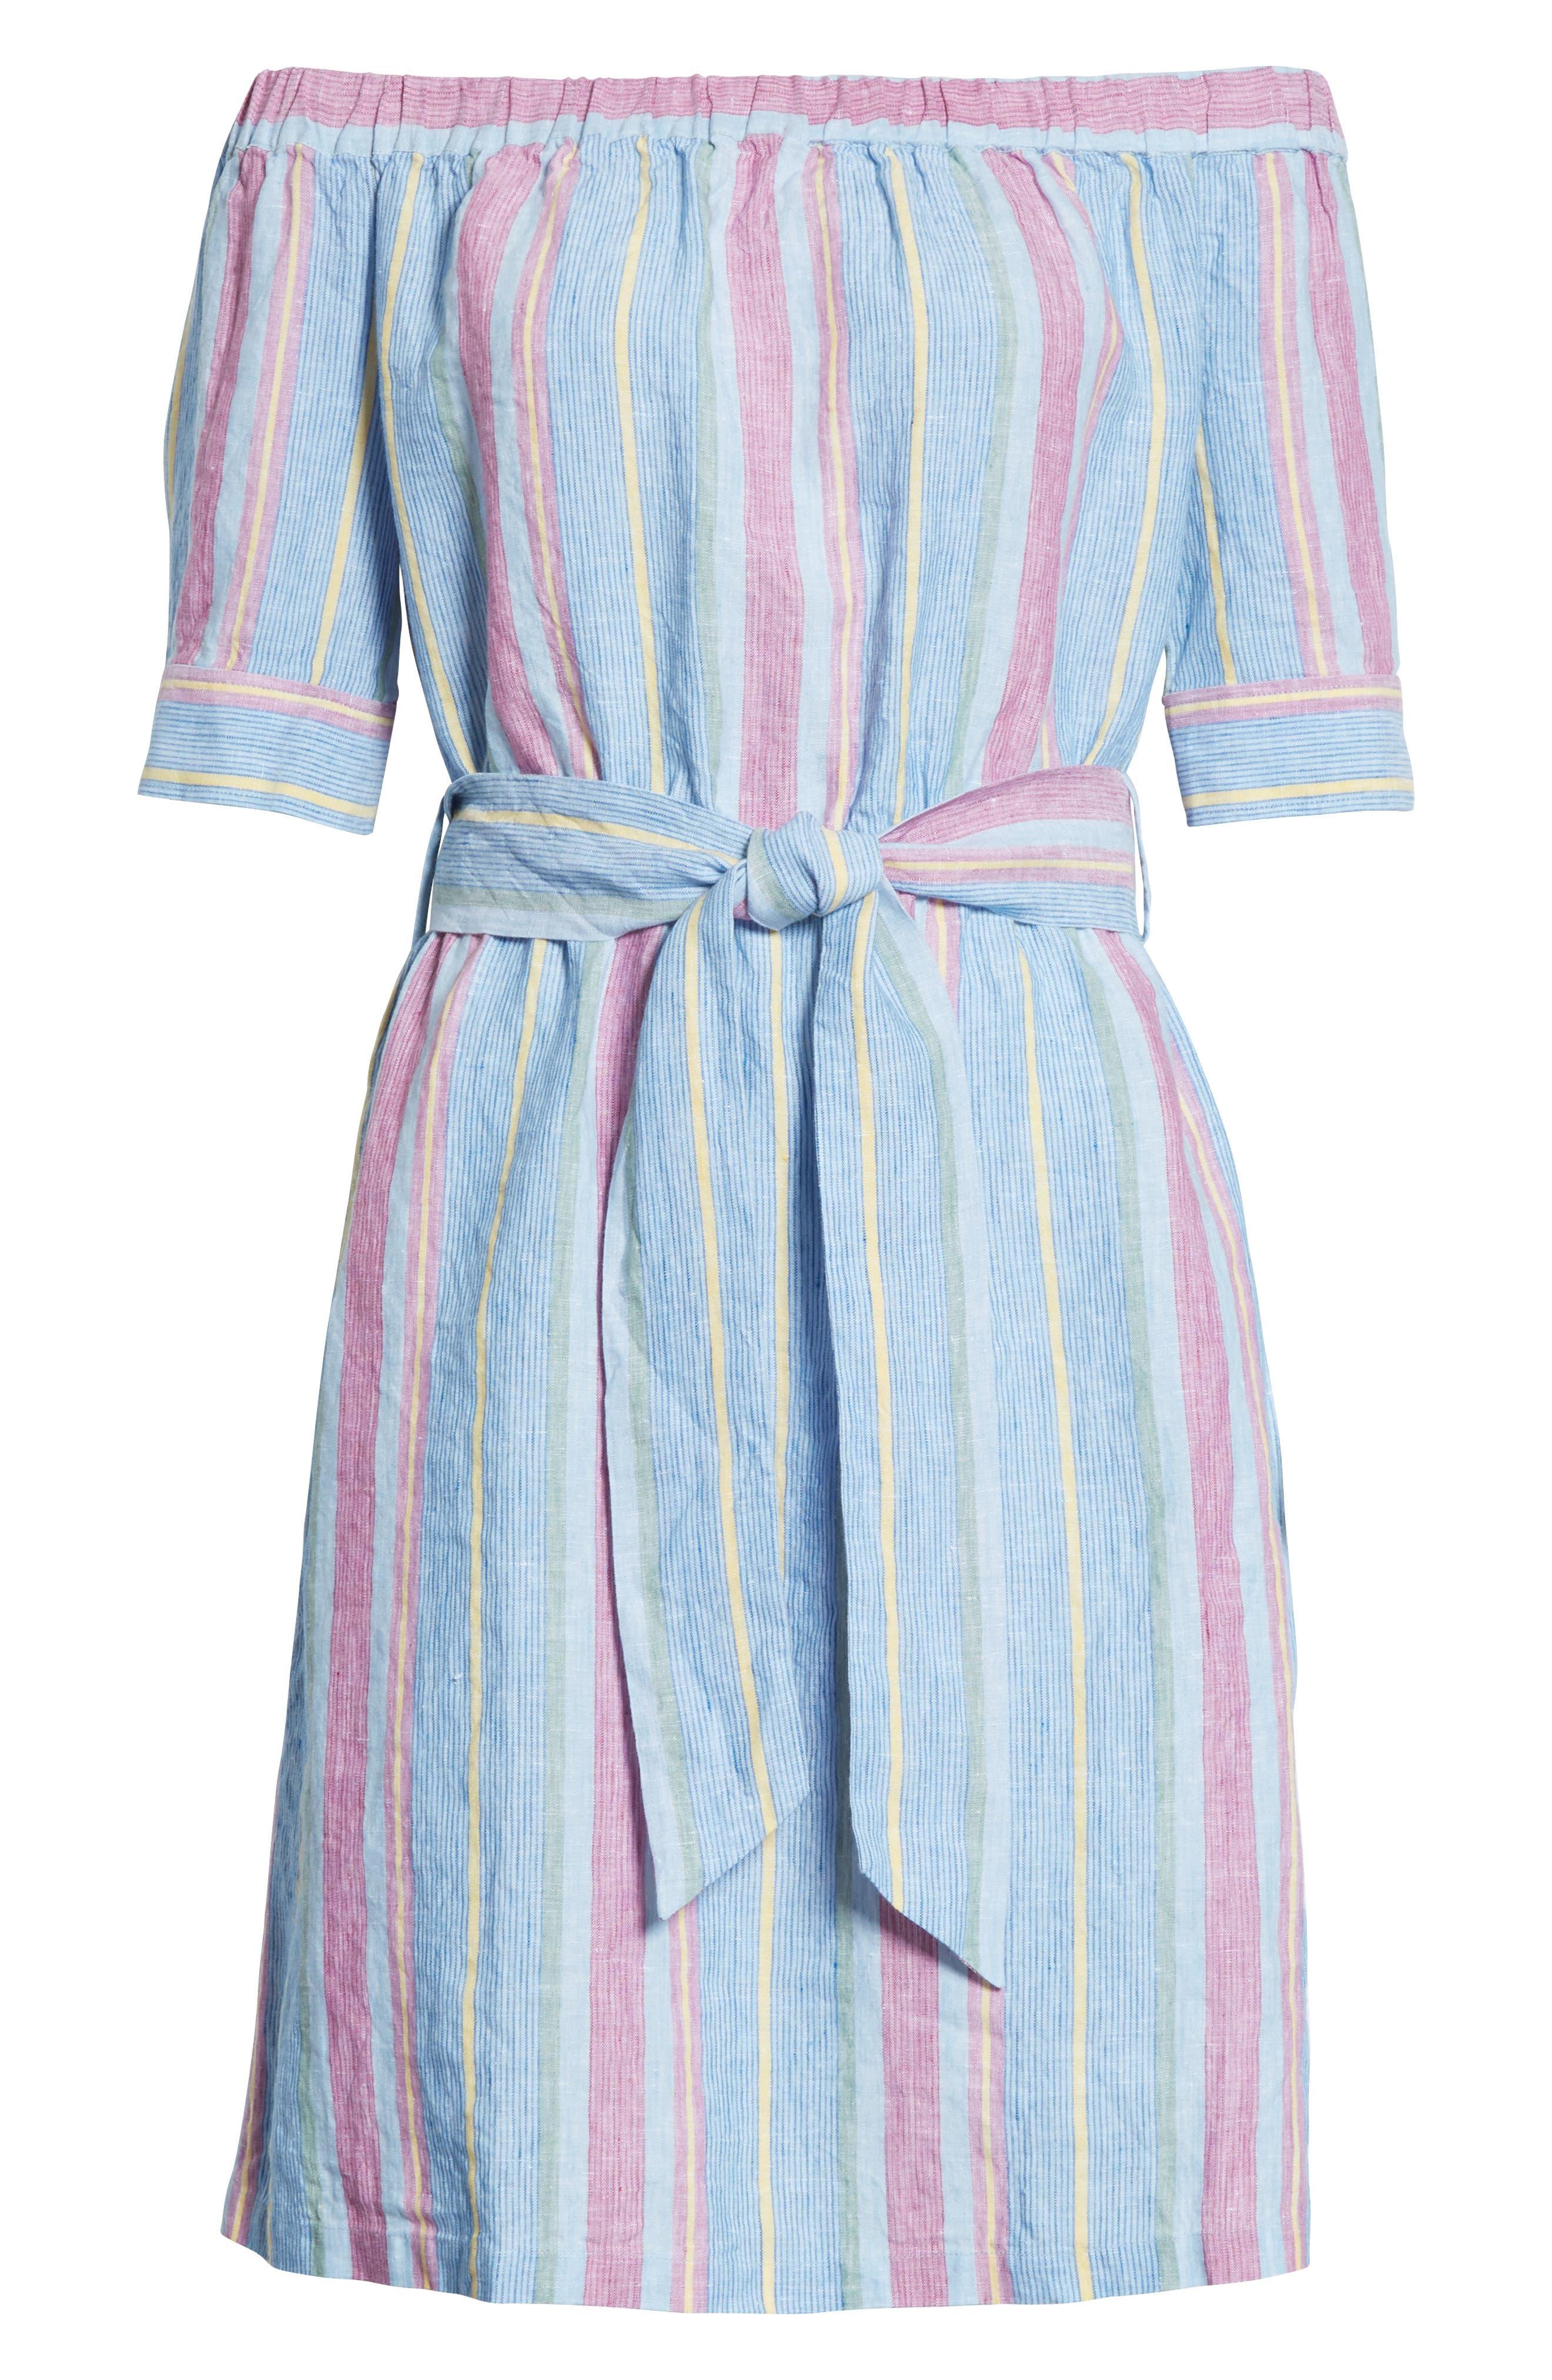 Stripe Off the Shoulder Linen Dress,                             Alternate thumbnail 6, color,                             501